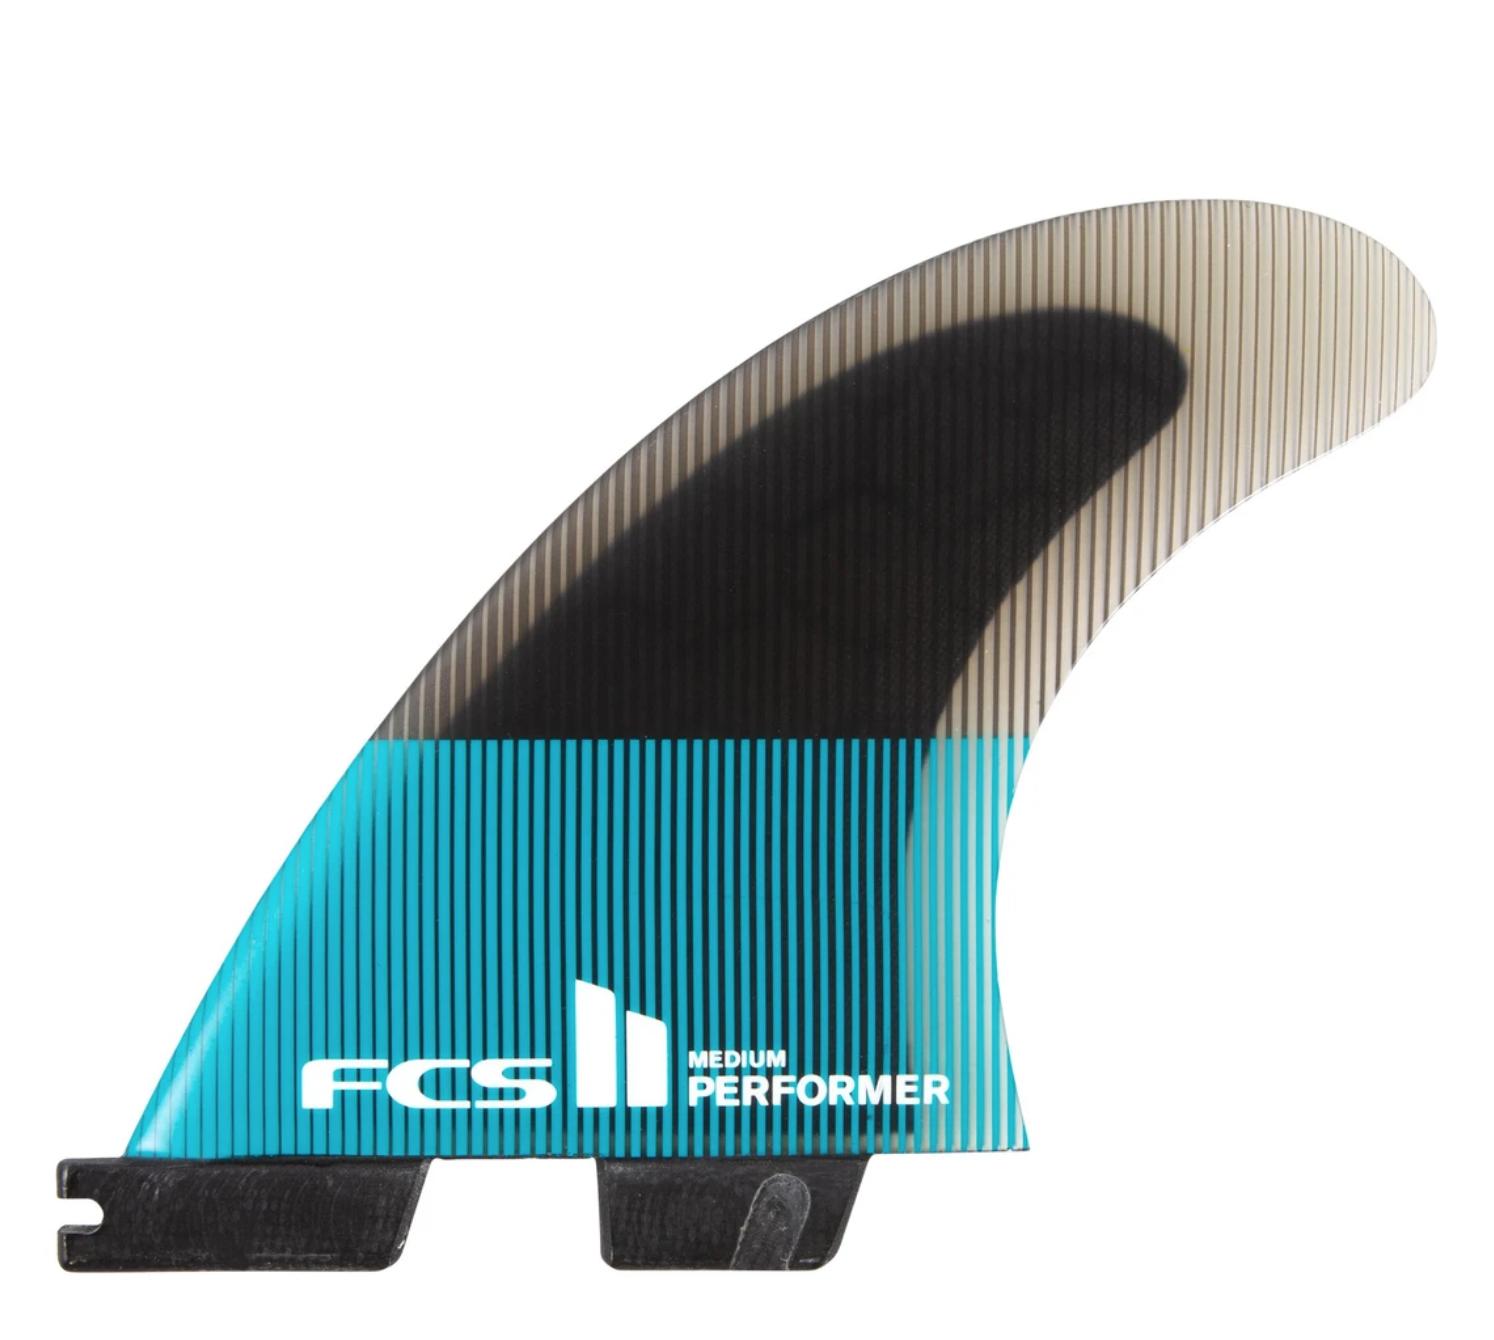 FCS FCS2 PERFORMER PC LARGE TEAL/BLACK TRI